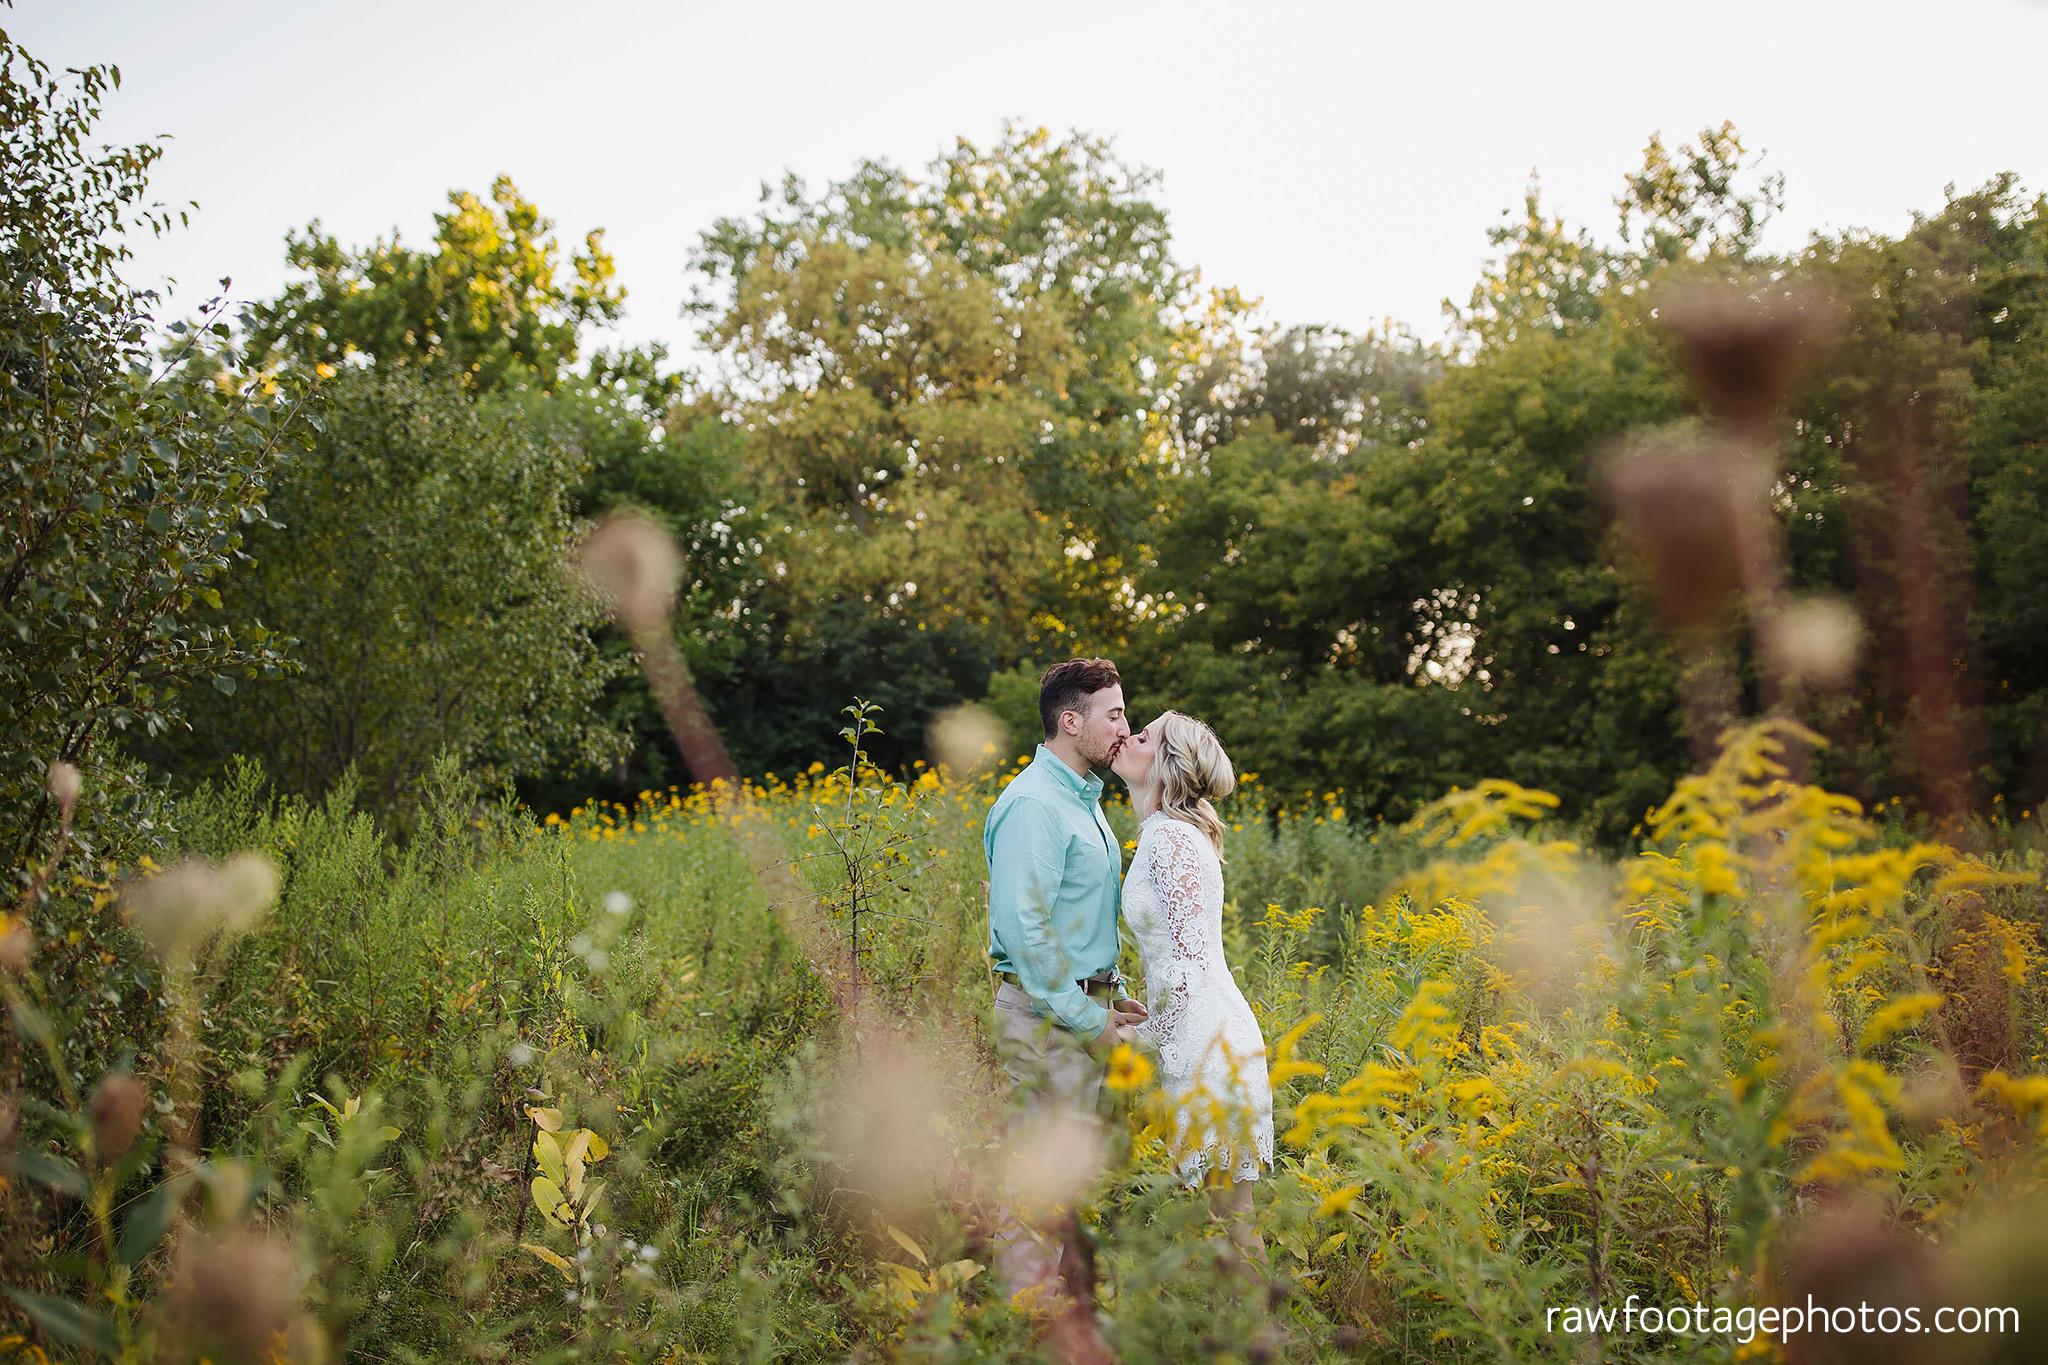 london_ontario_wedding_photographer-raw_footage_photography-engagement_session-uwo-campus-gibbons_park-woods034.jpg